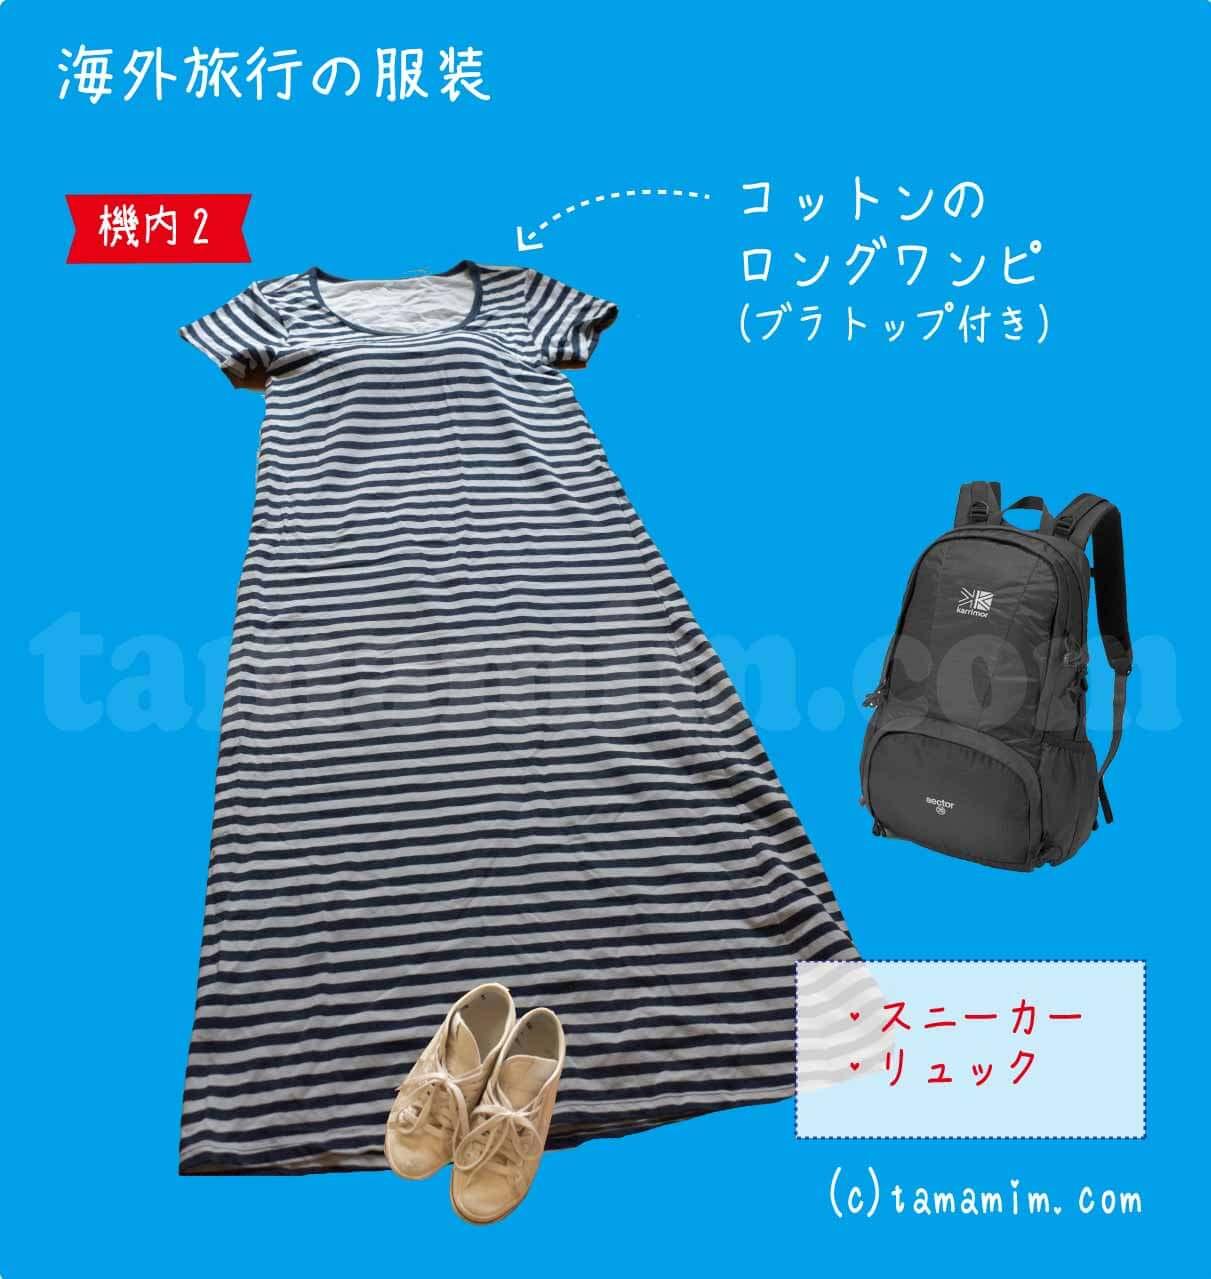 海外旅行の服装(機内)